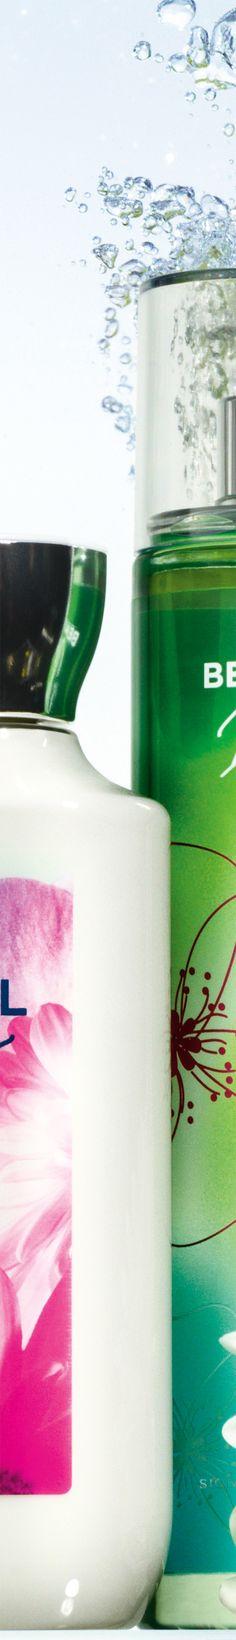 #BeautifulDay fragranc fan, bodi worksenough, beauti product